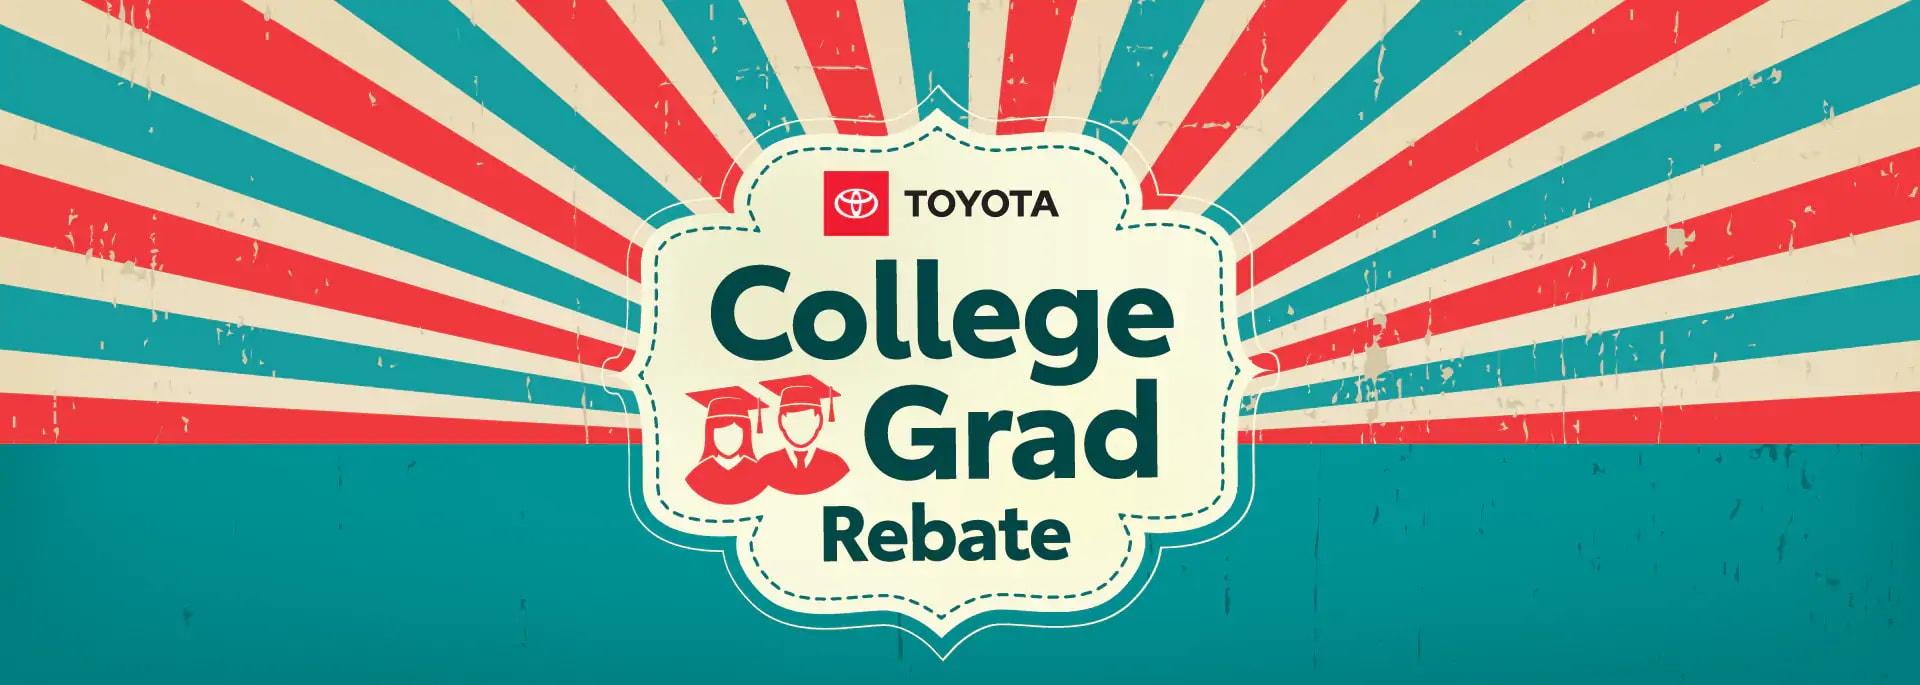 College Grad Rebate at South Toyota